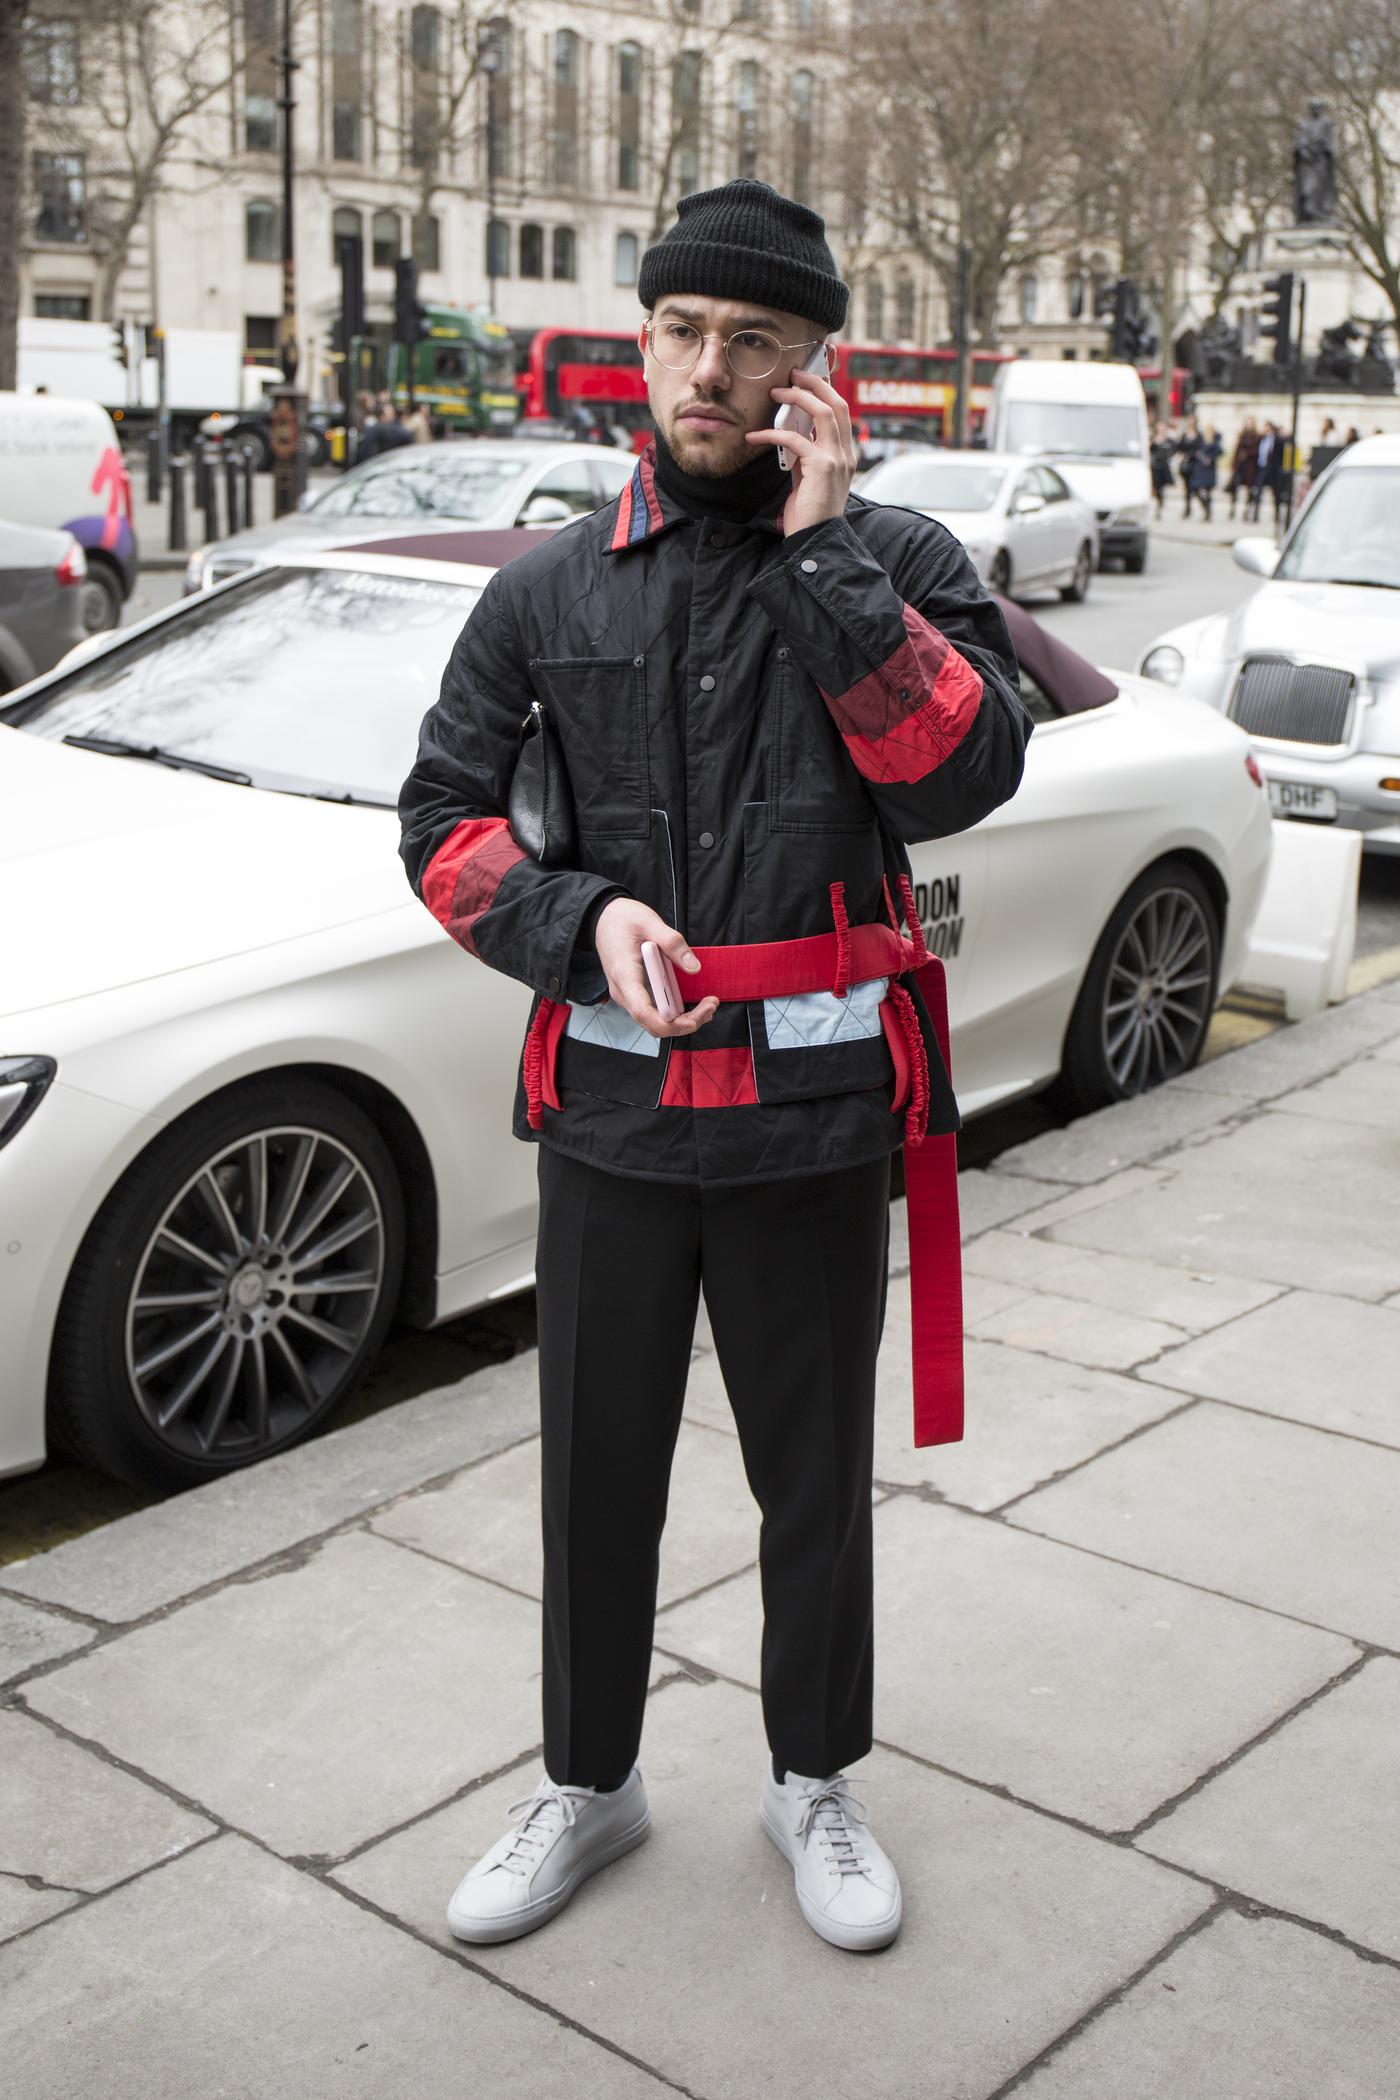 Street Style Shots: London Fashion Week Part 2